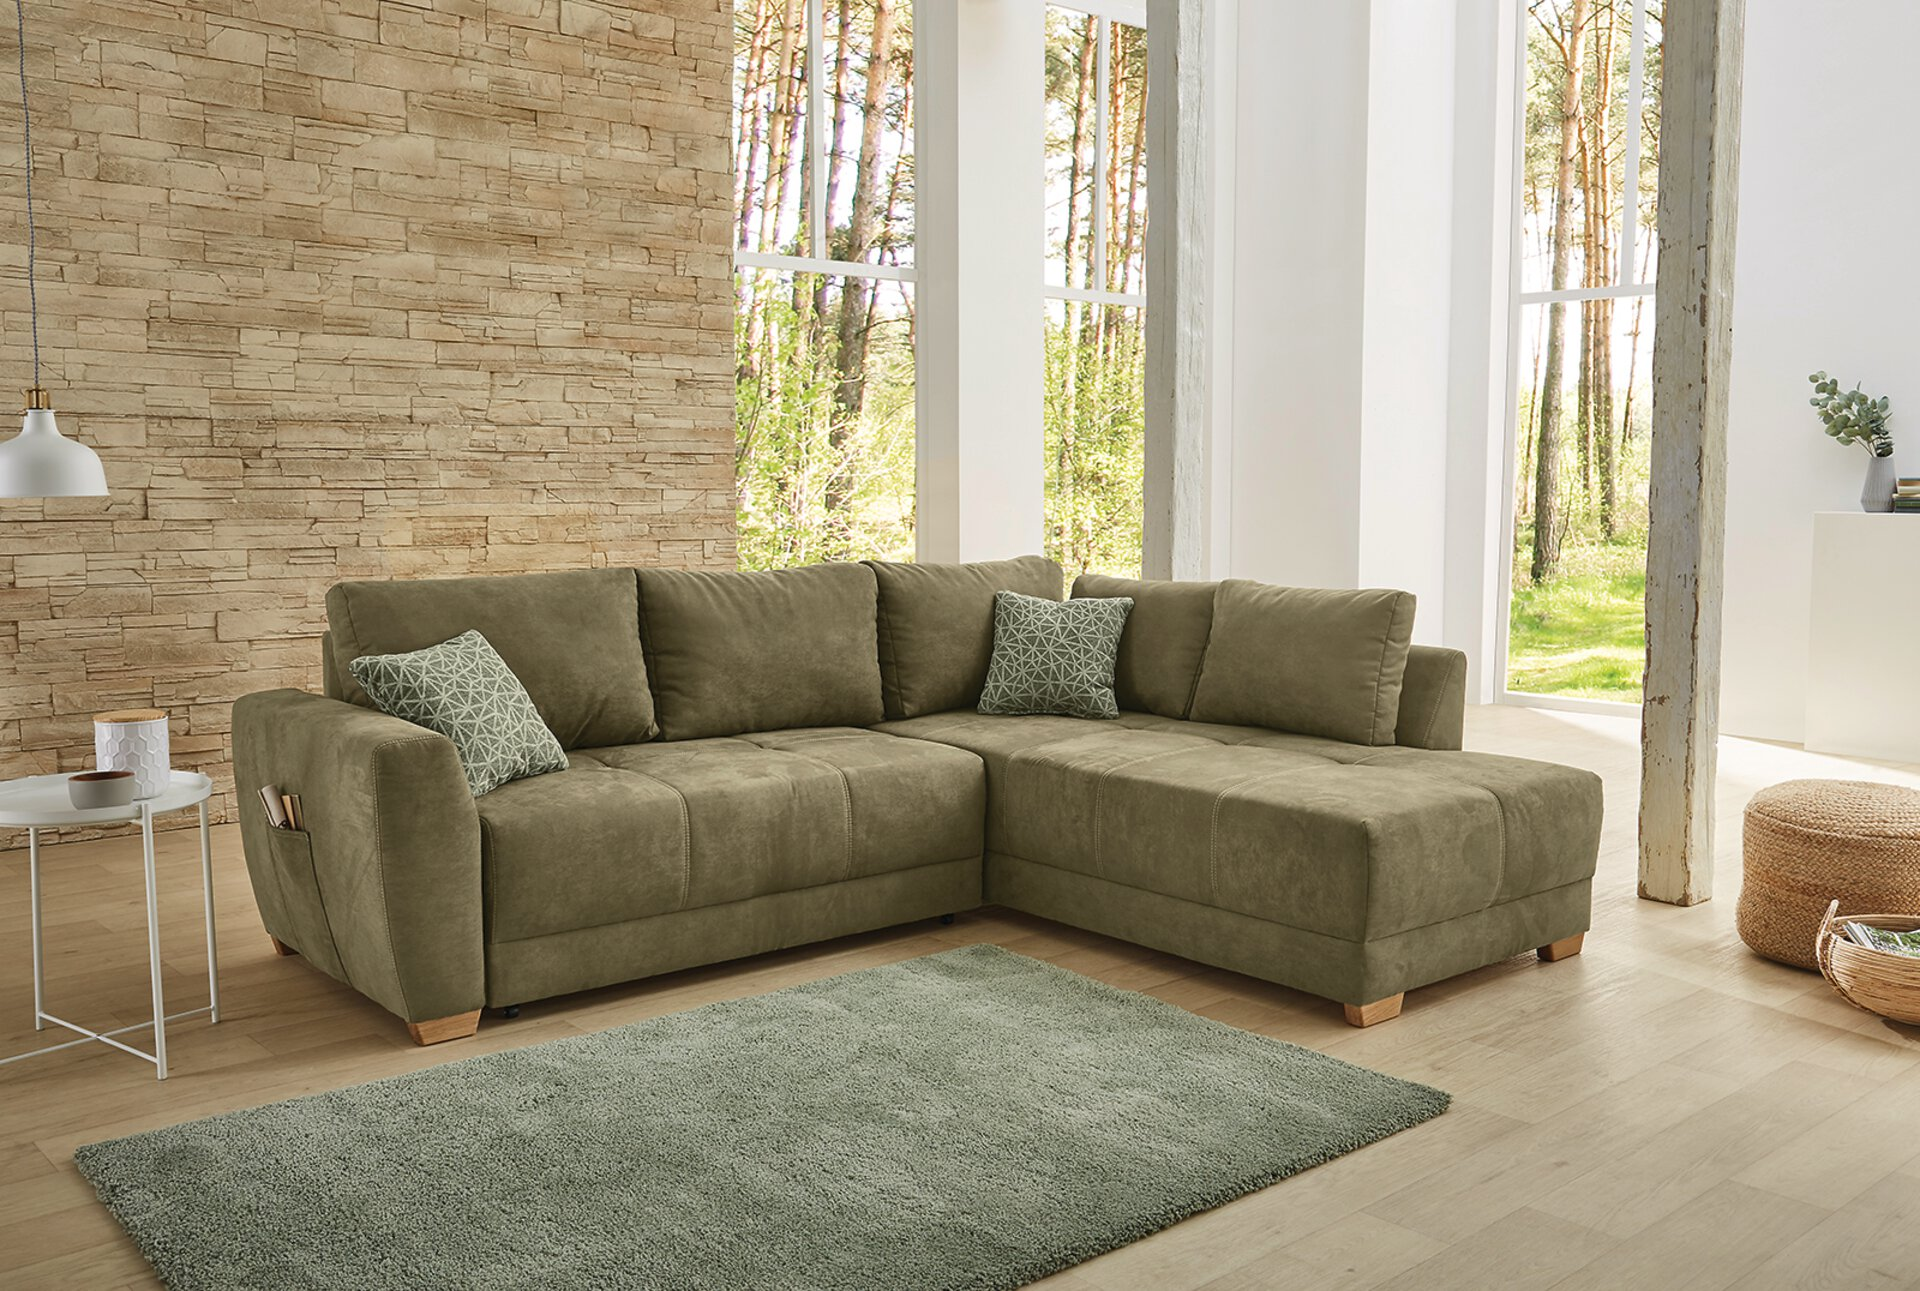 Ecksofa LUZERN-SE CELECT Textil 208 x 87 x 254 cm